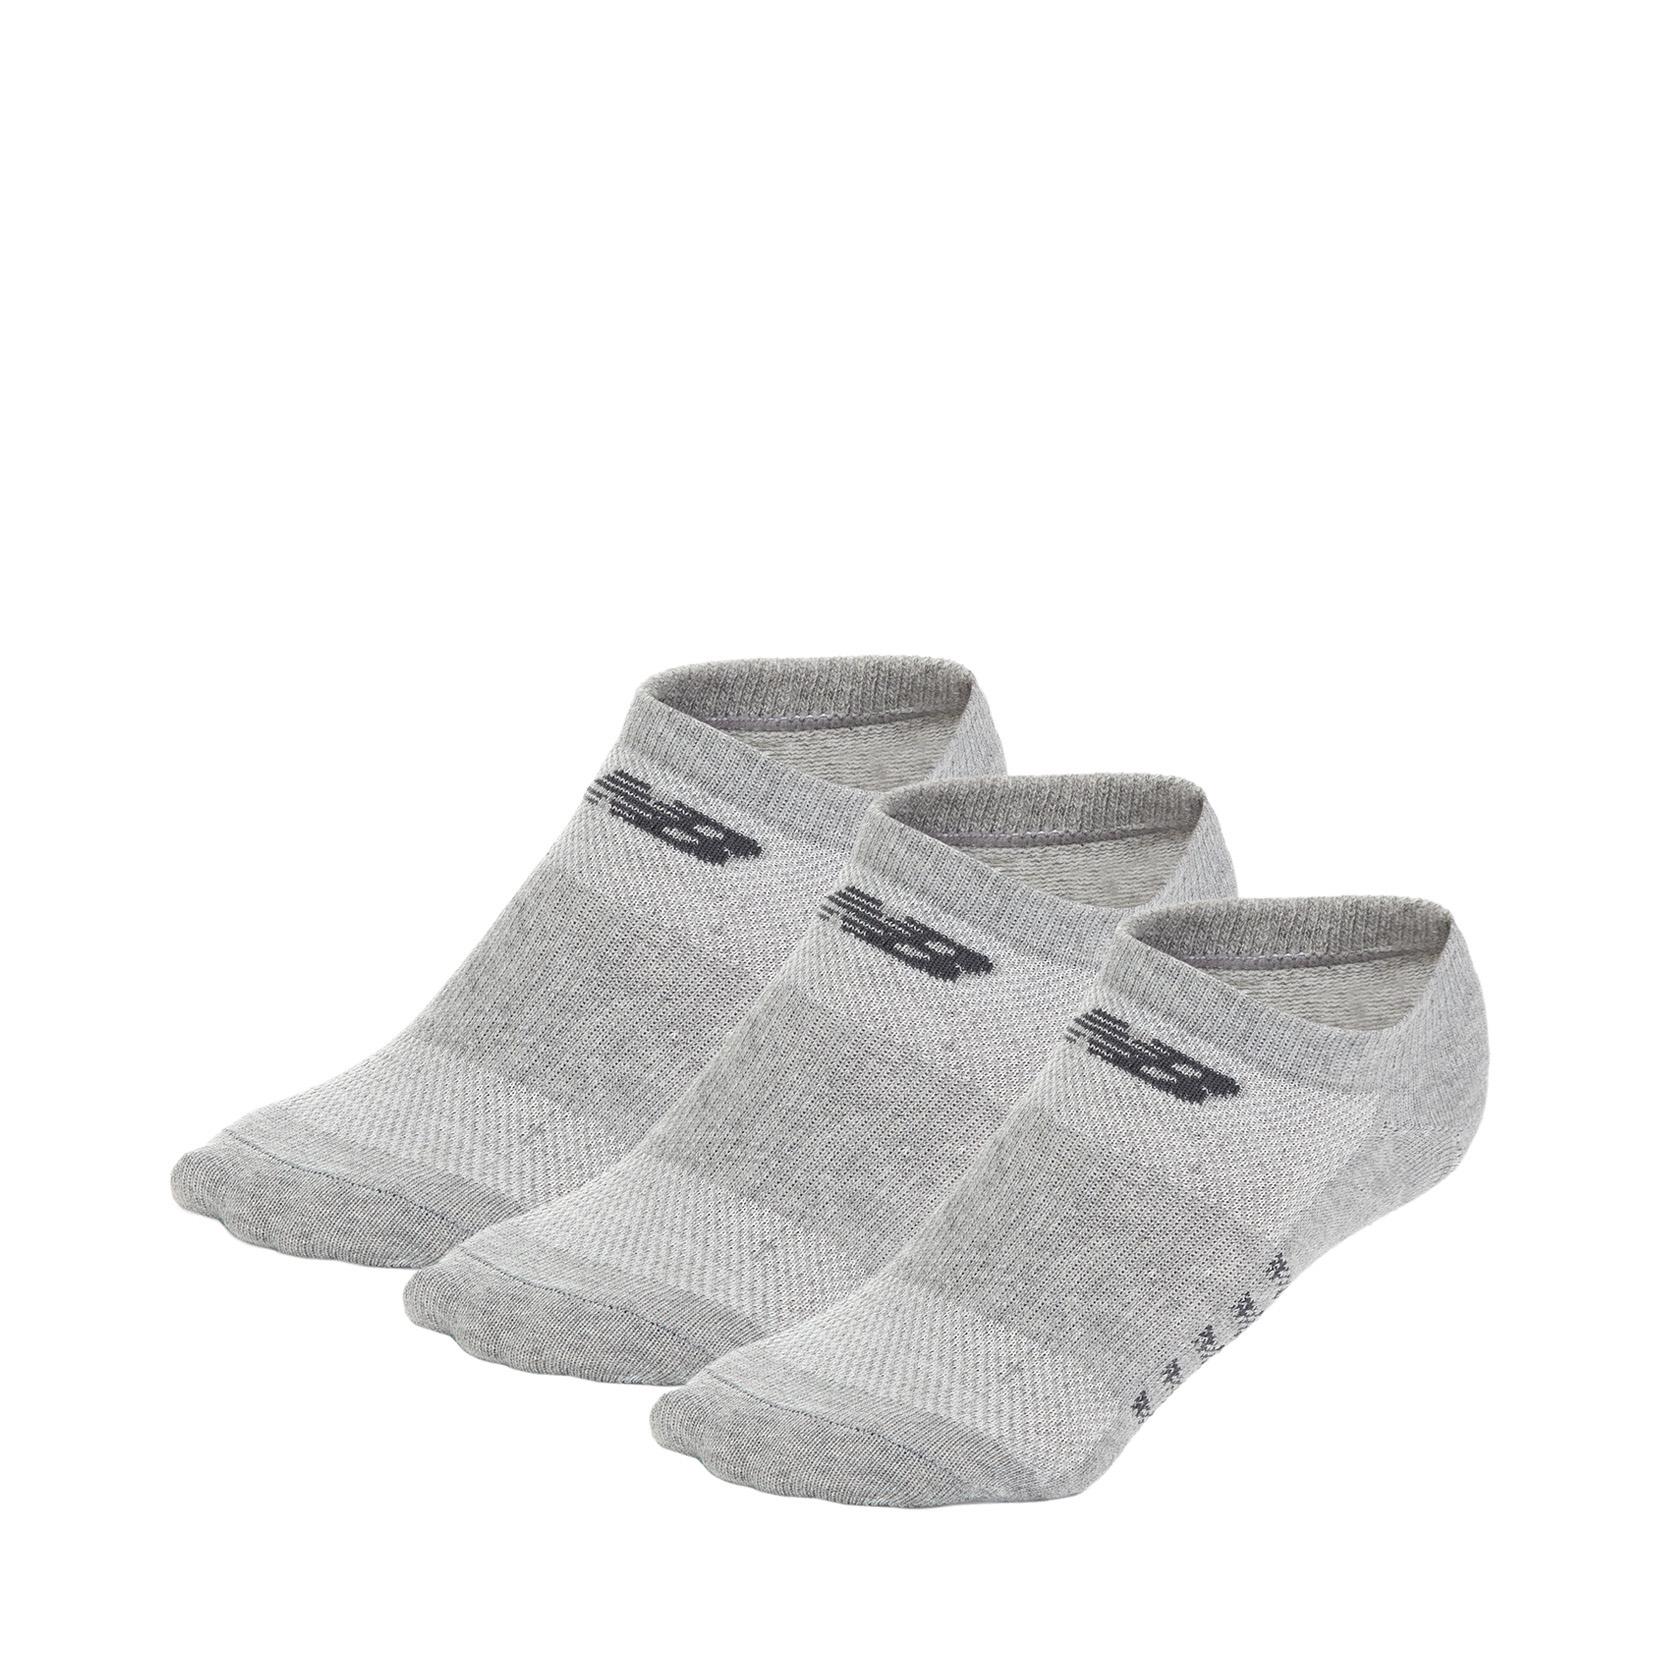 Шкарпетки No Show - Flat Knit (3 пари) N623-3EU_GRY | New Balance